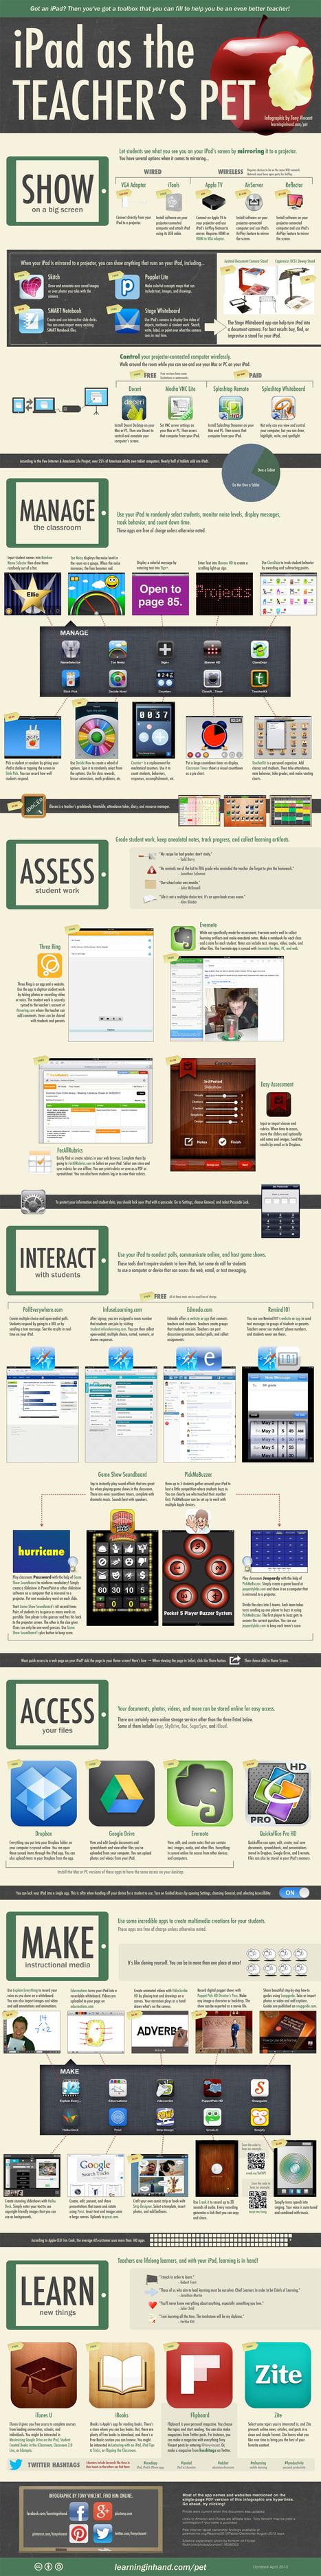 ipad-as-the-teachers-pet-infographic_516235de0bdff.png (1200x9636 pixels)   TABLETS AT SCHOOL   Scoop.it